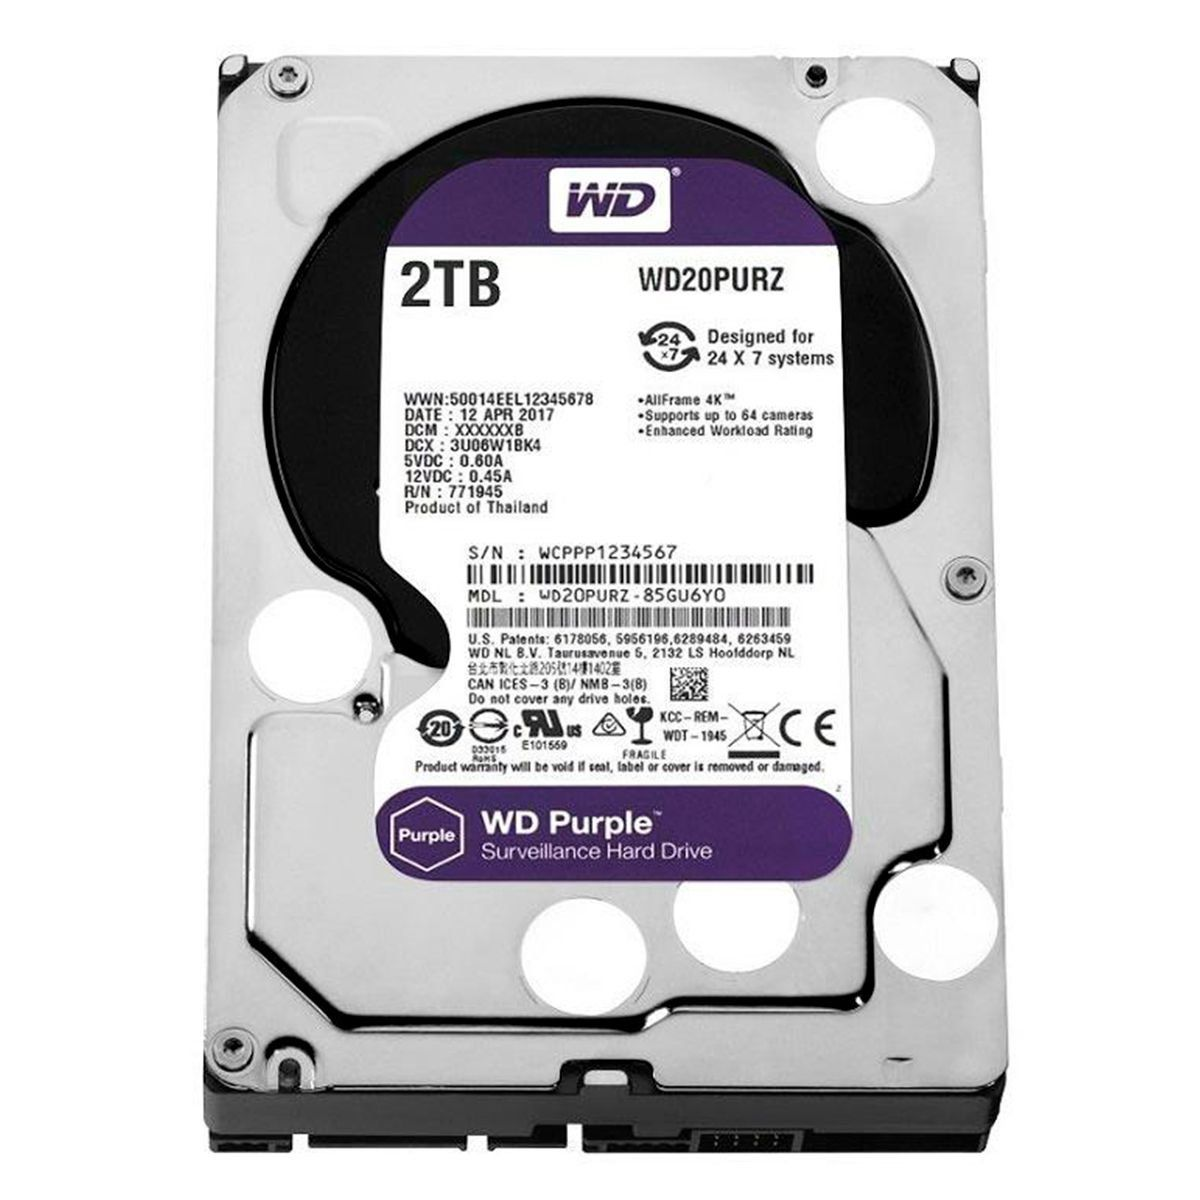 Kit 10 Câmeras de Segurança Intelbras Full HD 1080p VHD 1220B IR + DVR Full HD C/ HD  2TB + Acessórios